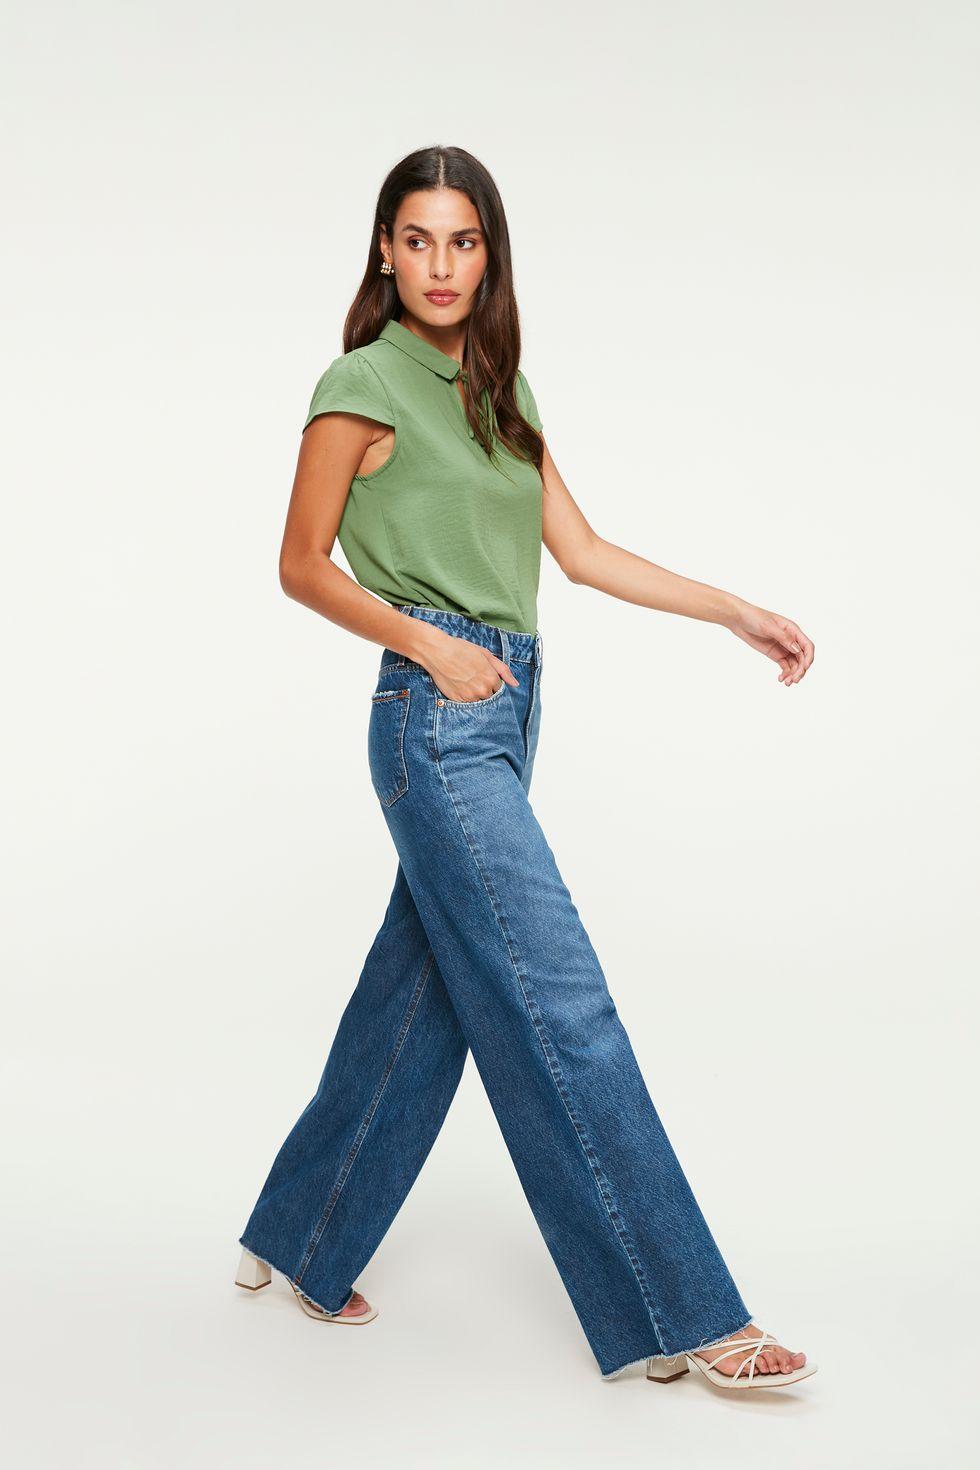 Calça Jeans Wide Leg Cintura Super Alta Tam: 34 / Cor: MEDIA